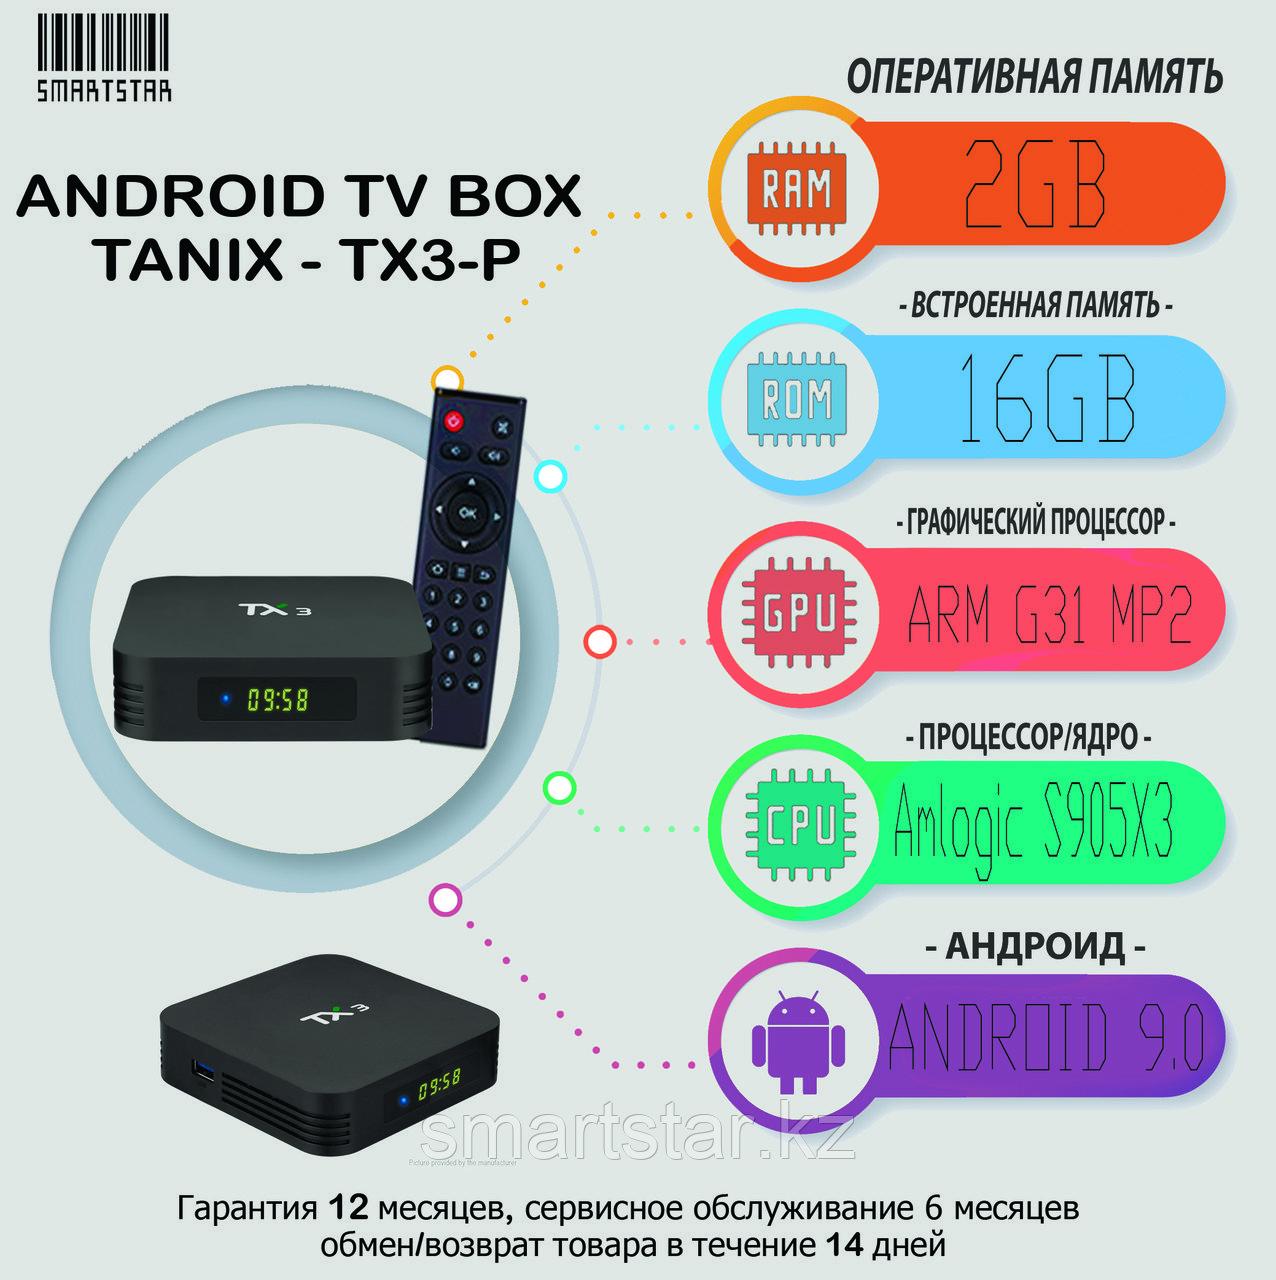 ANDROID TV BOX приставка - Tanix TX3-P (2/16GB)